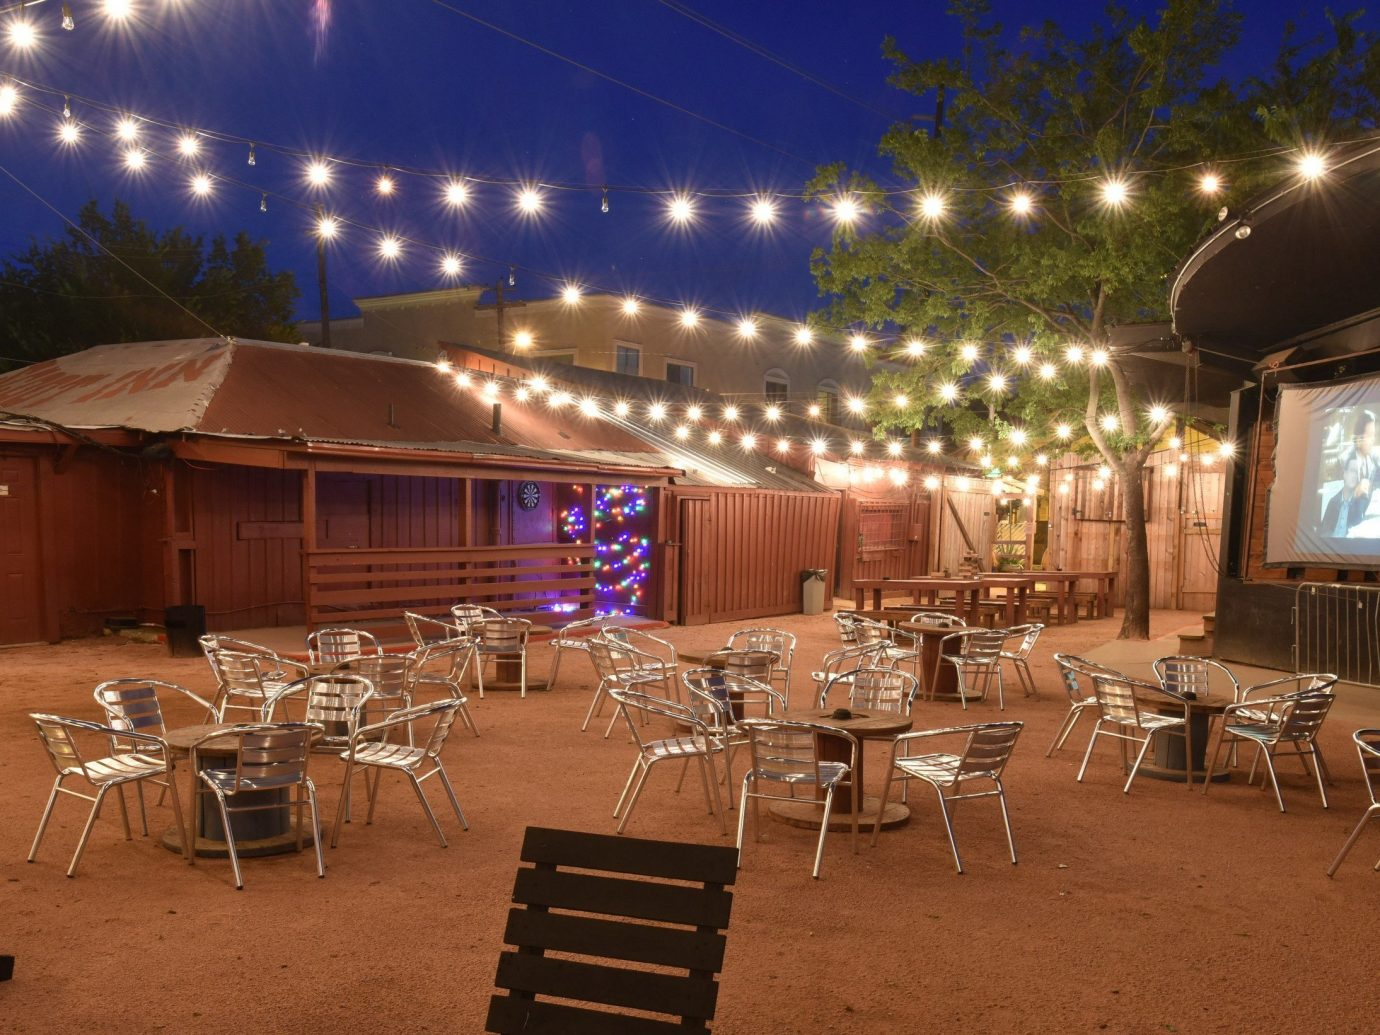 Trip Ideas chair outdoor ground function hall meal restaurant estate banquet ballroom set day